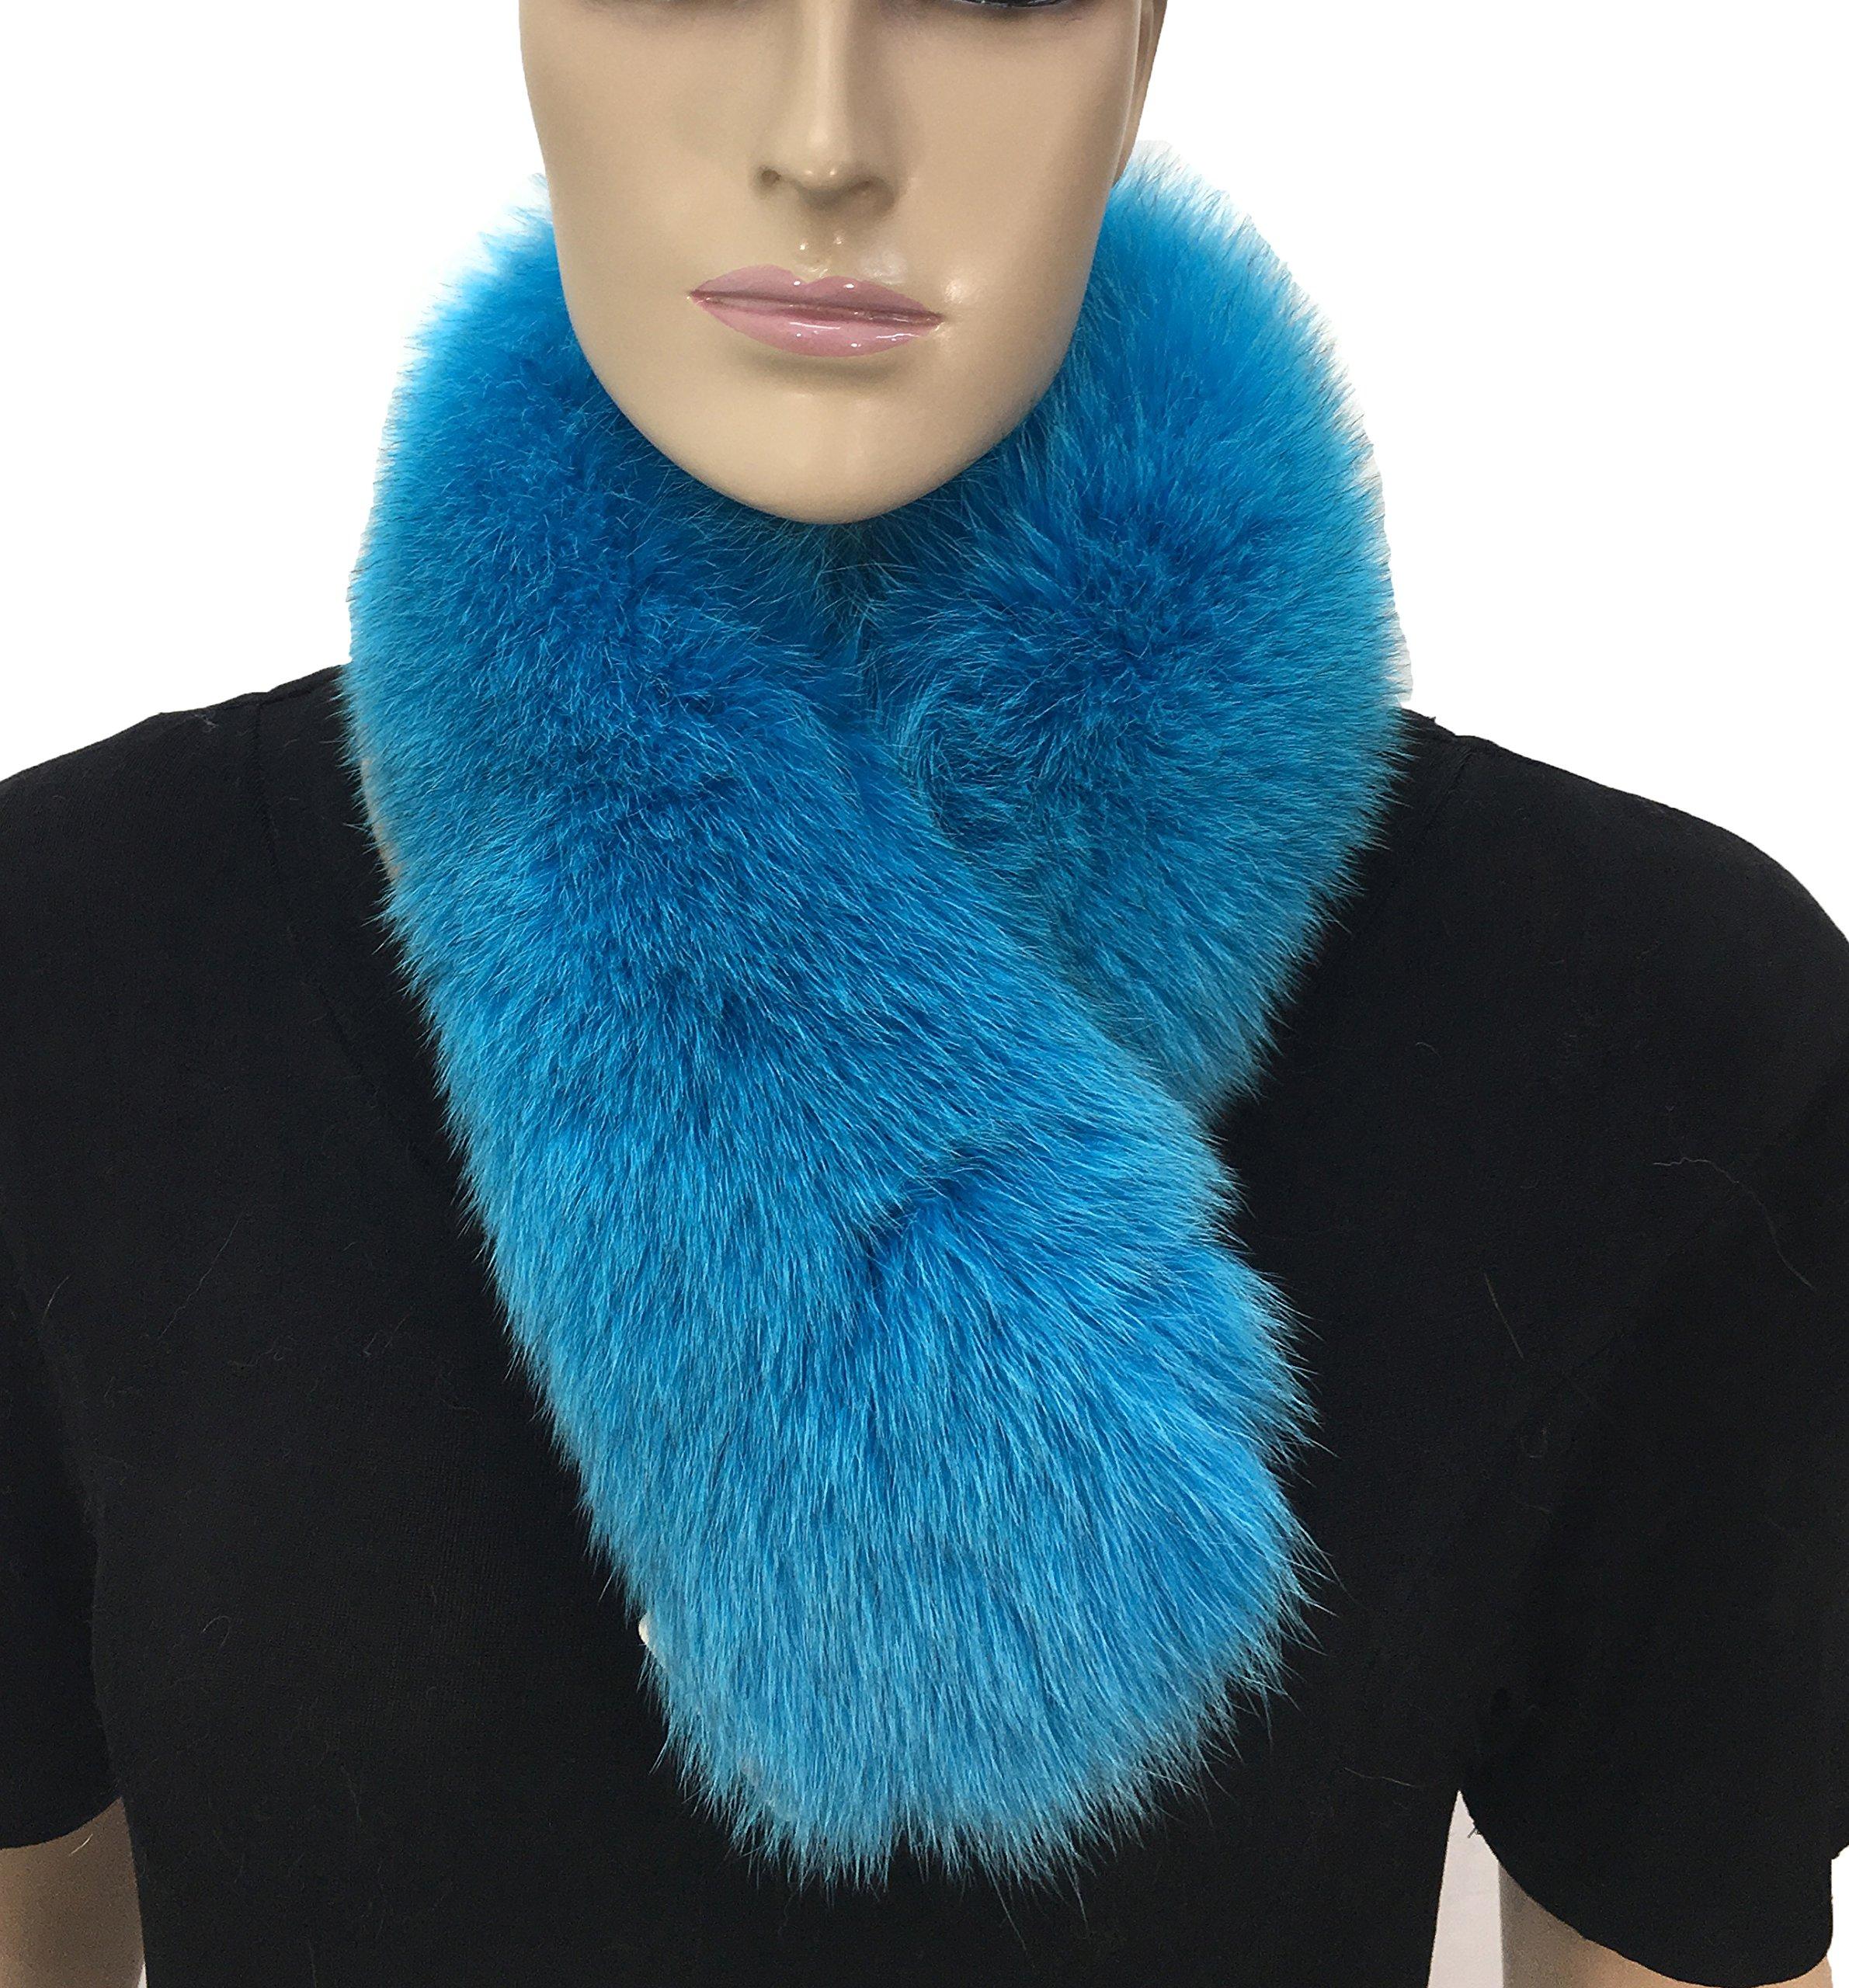 HIMA 100% Real Fox Fur Headband (Navy Blue)